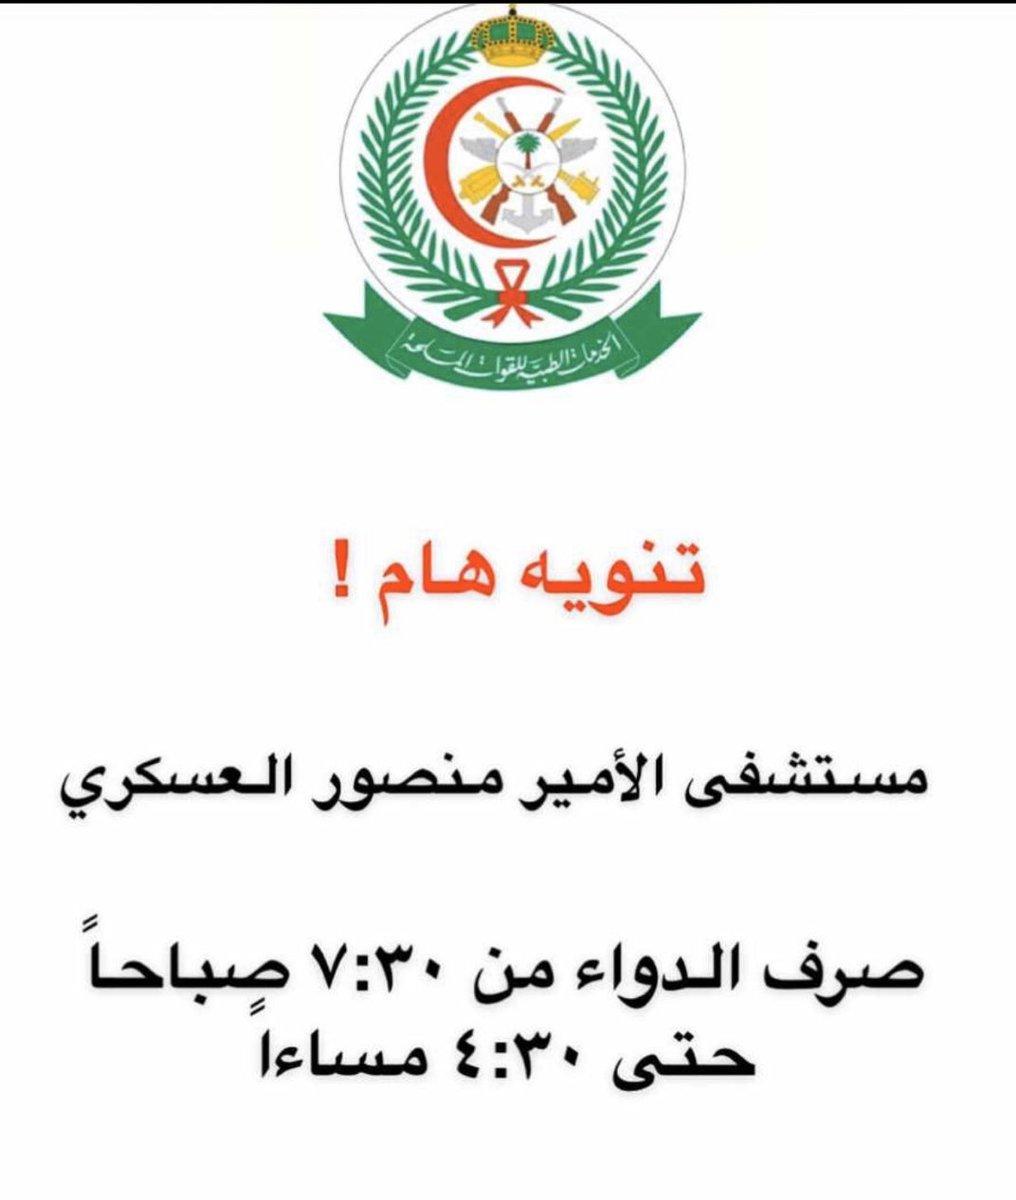 حجز موعد اسنان مستشفى الامير منصور - doted24.blogspot.com